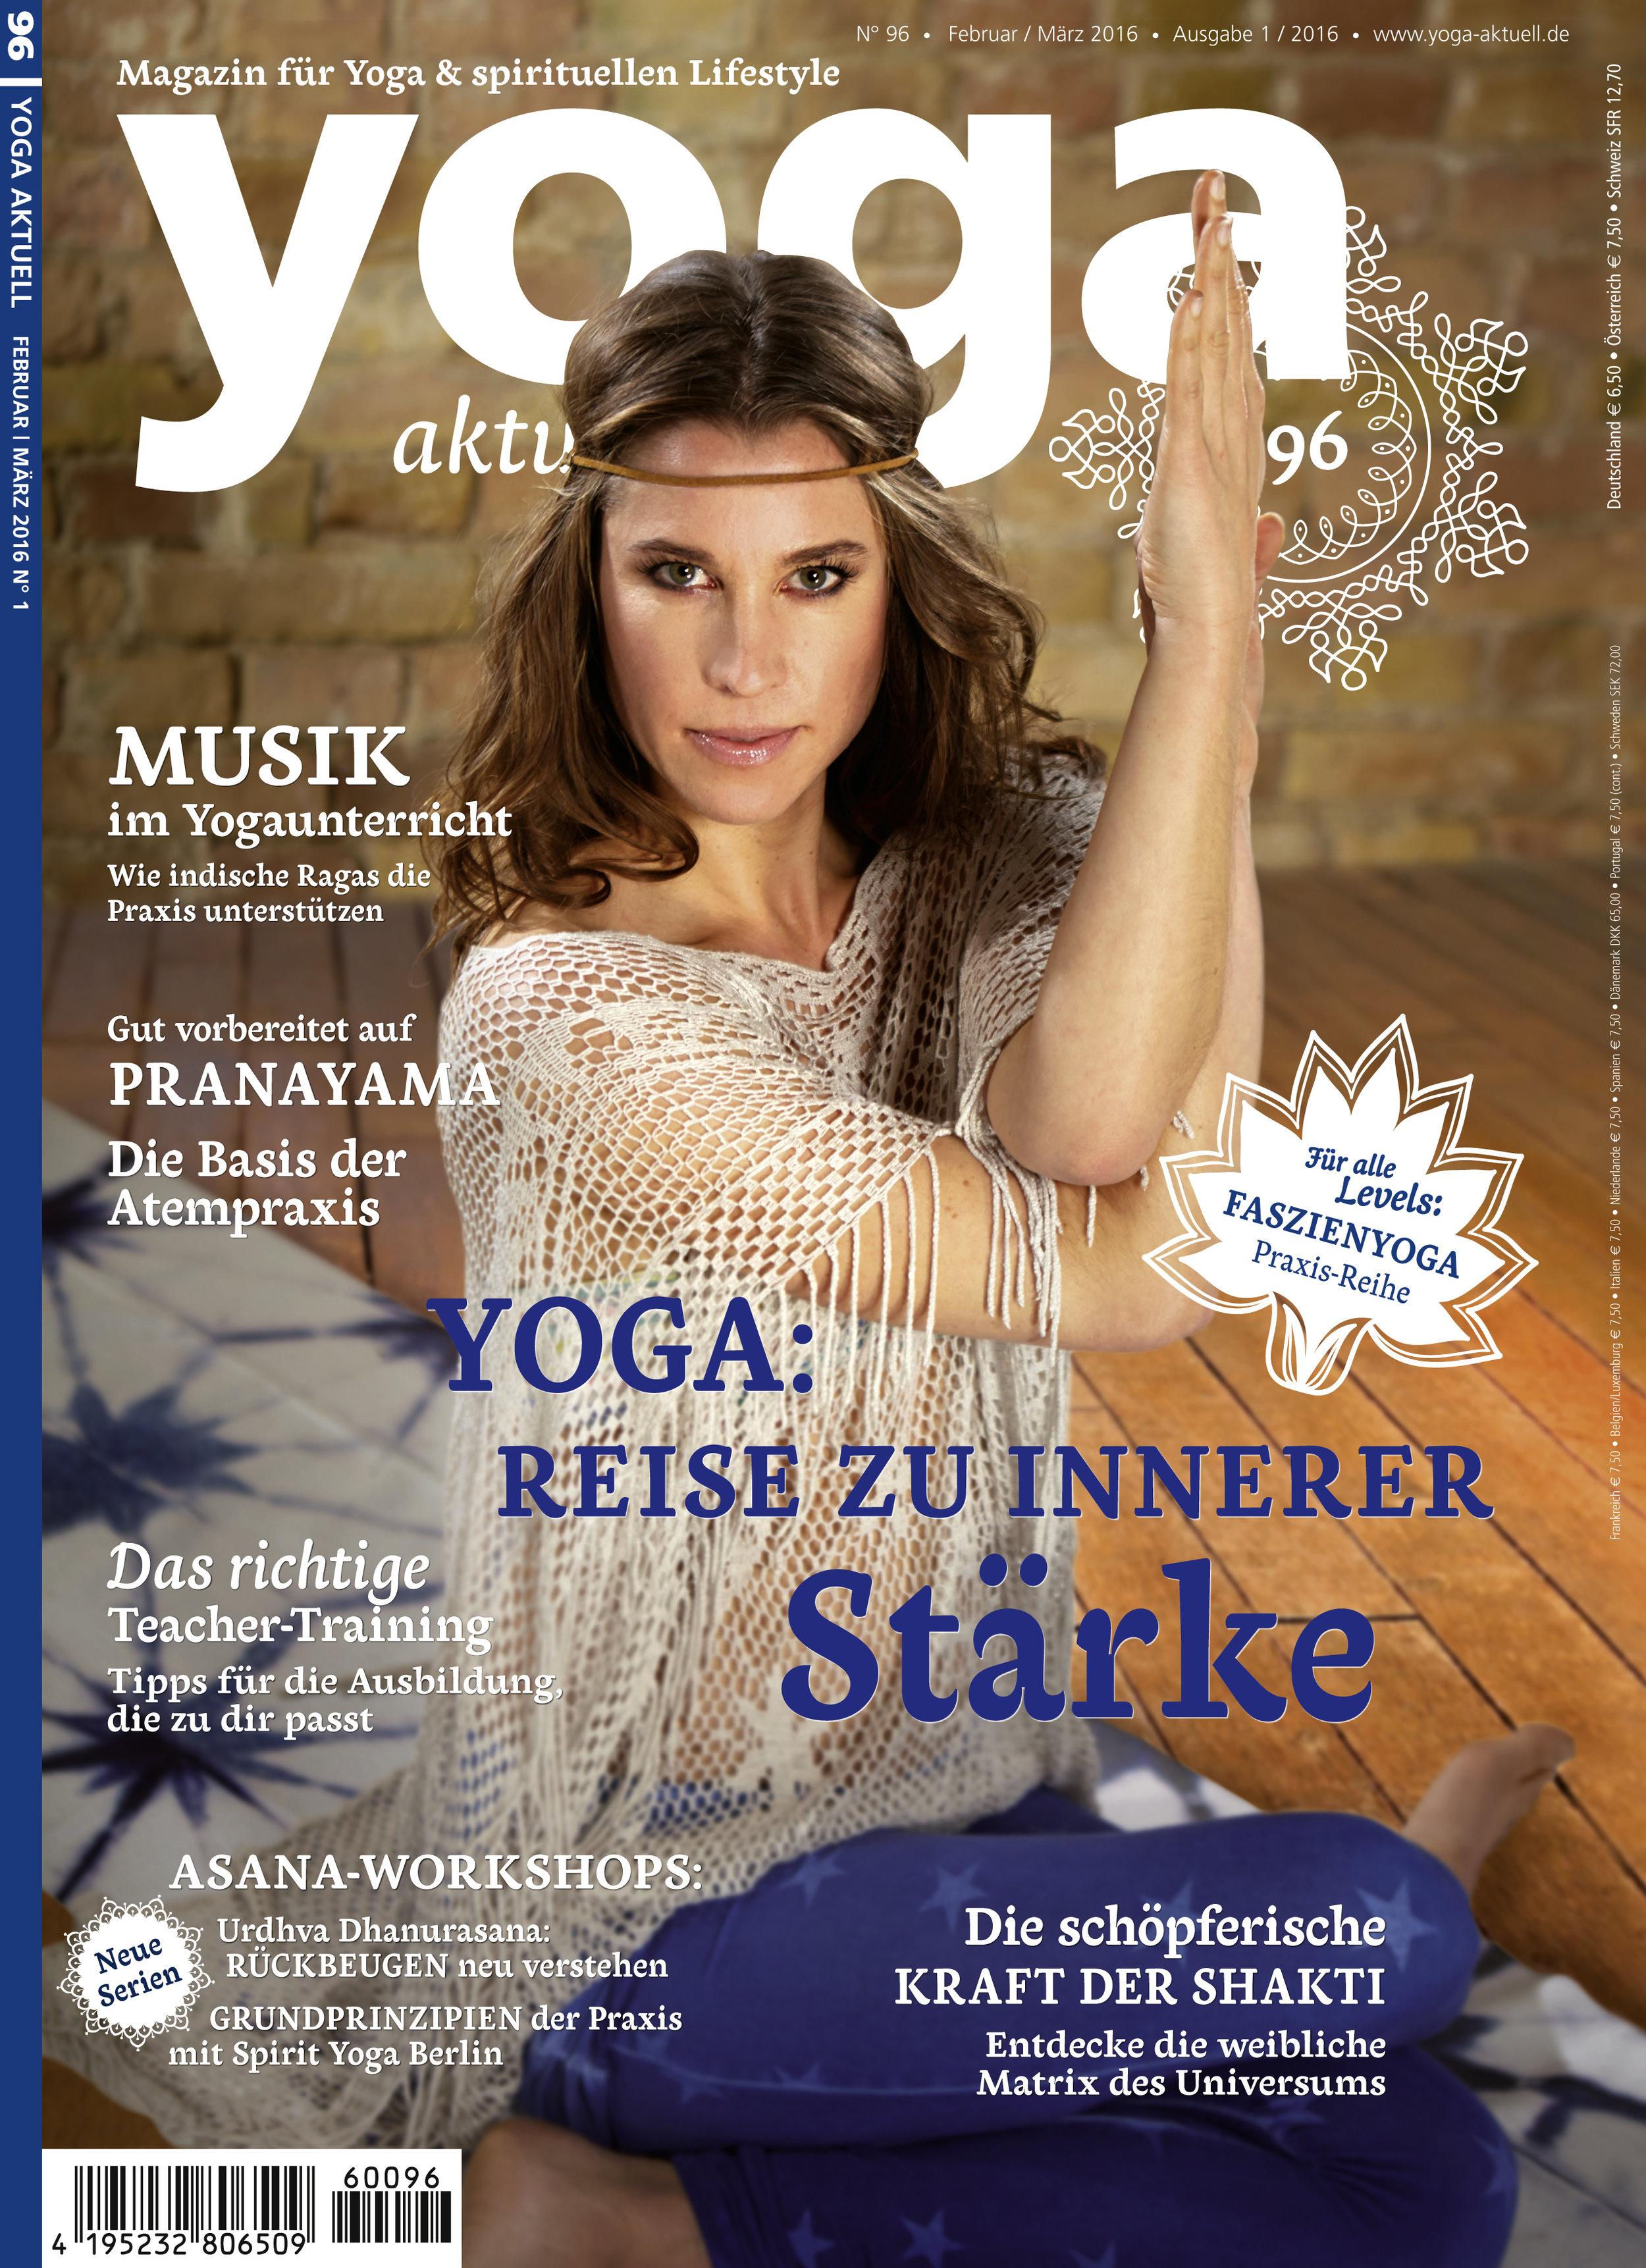 Cover96_NEU.jpg